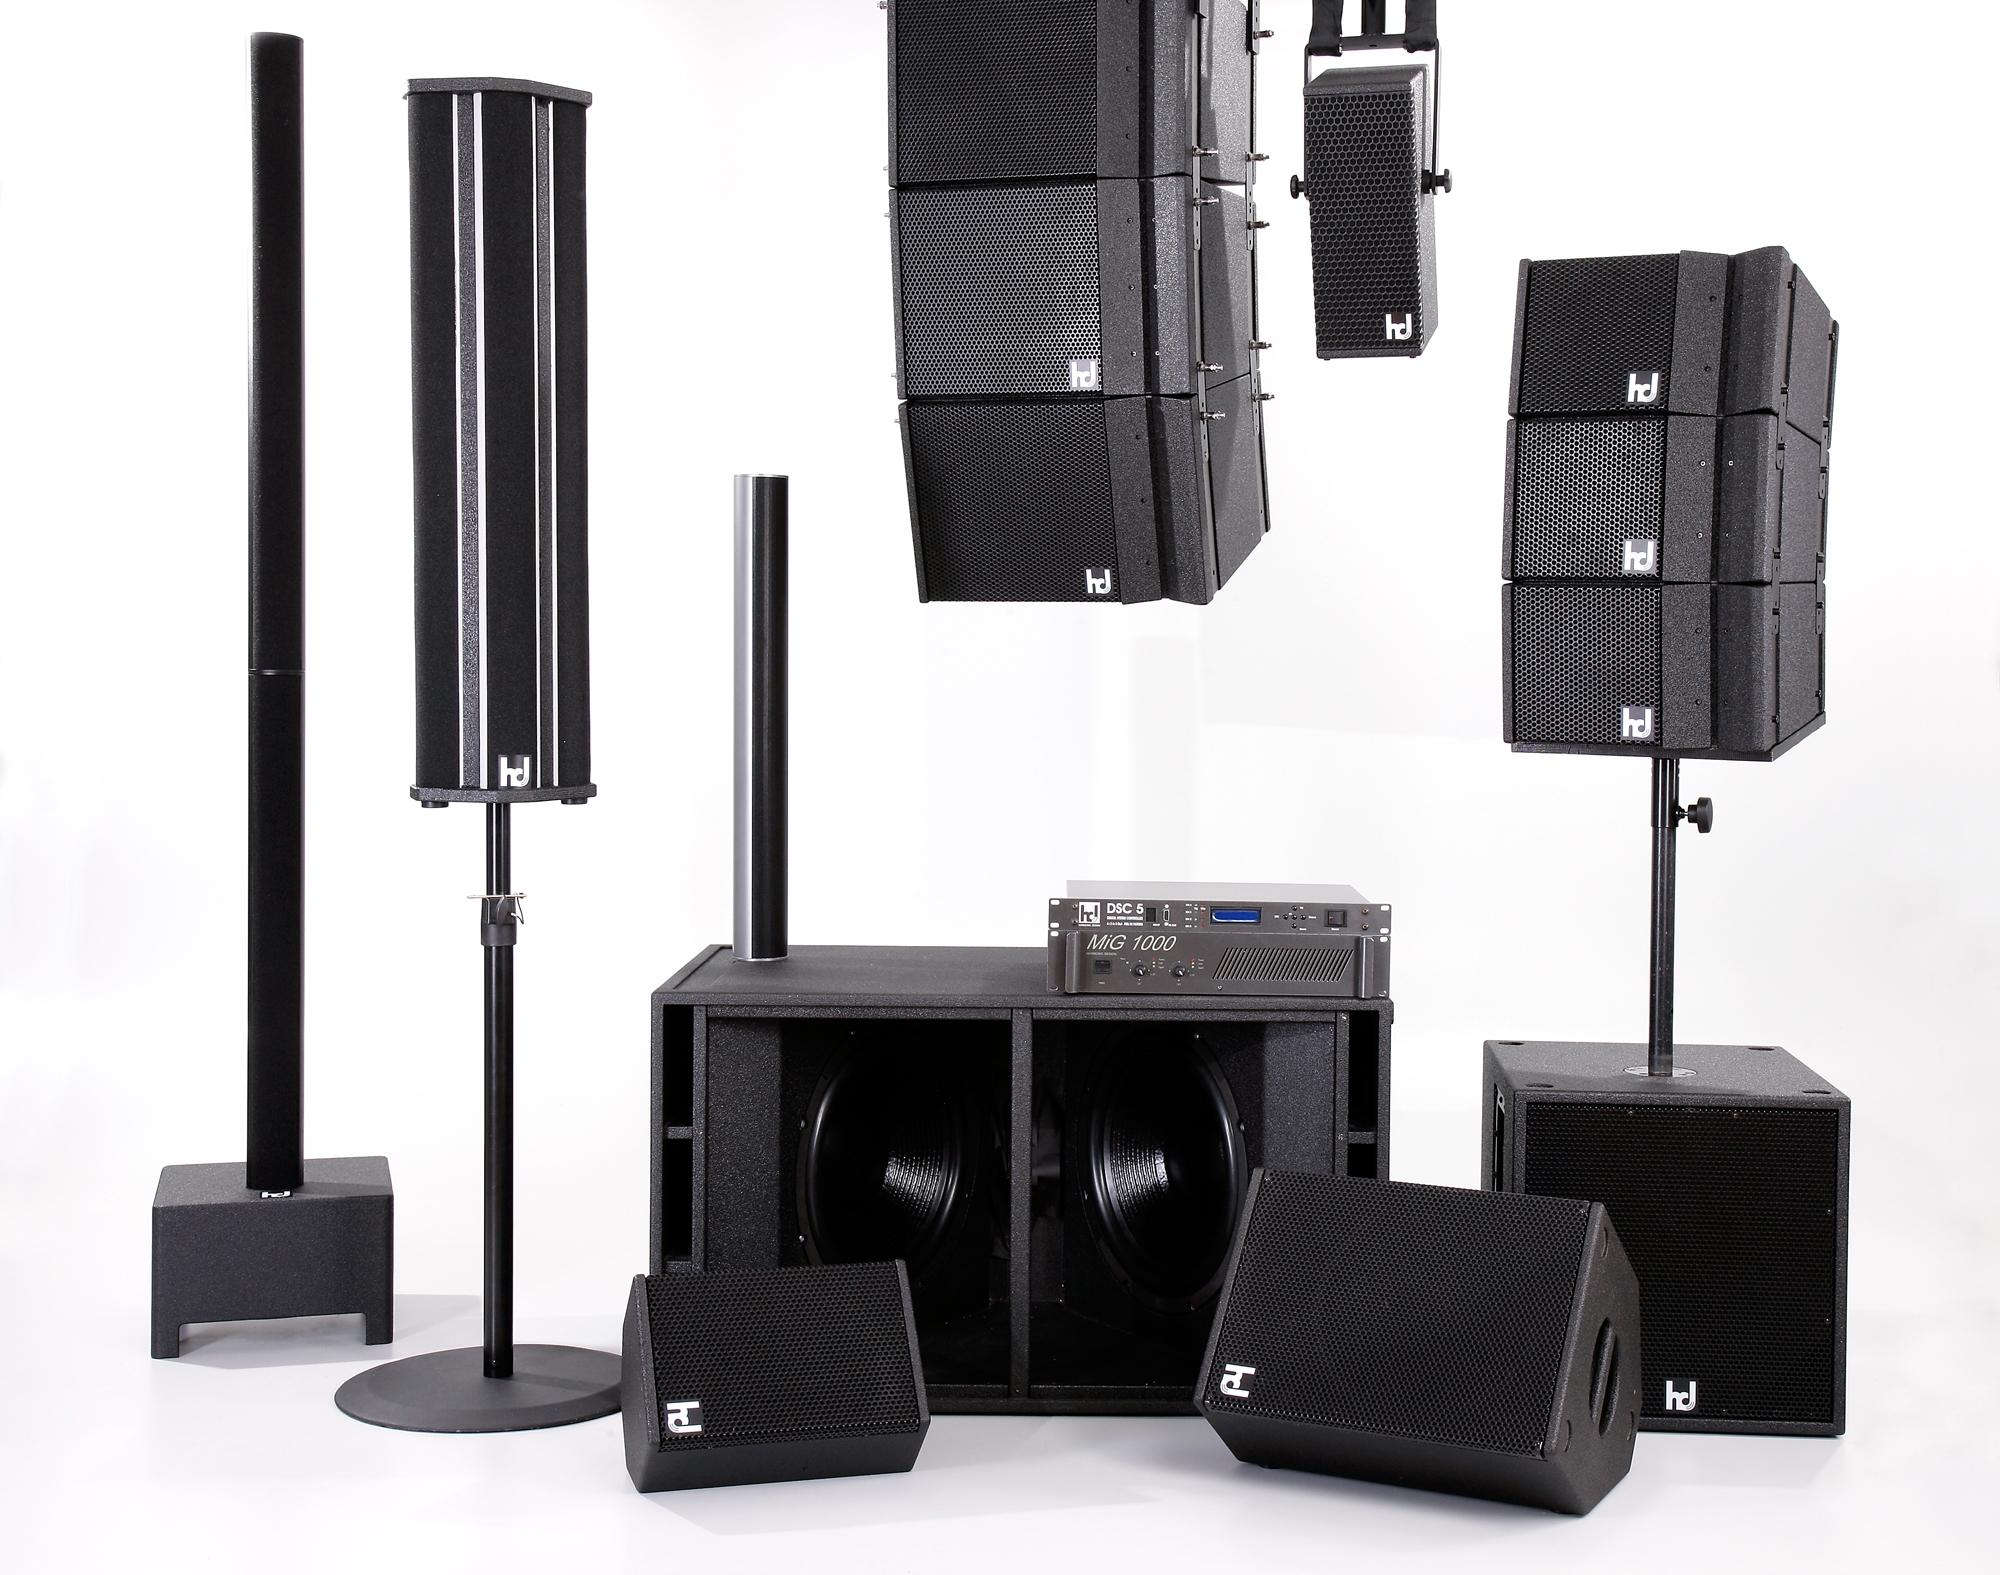 2008: Harmonic Design Säulenlautsprecher erobern den Markt ...